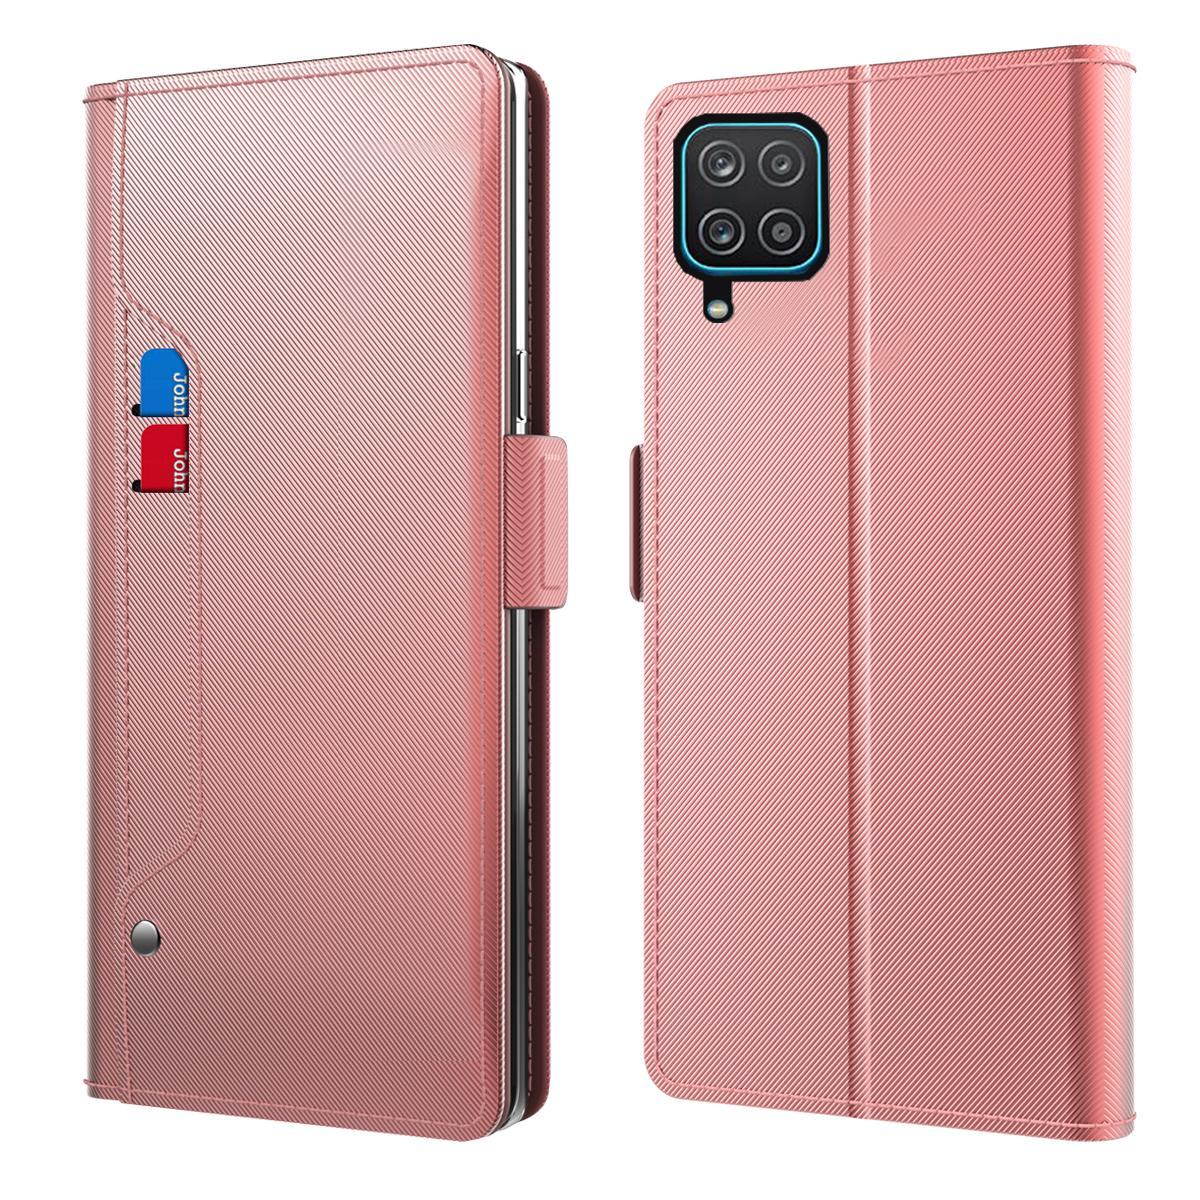 Plånboksfodral Spegel Samsung Galaxy A42 5G Rosa Guld